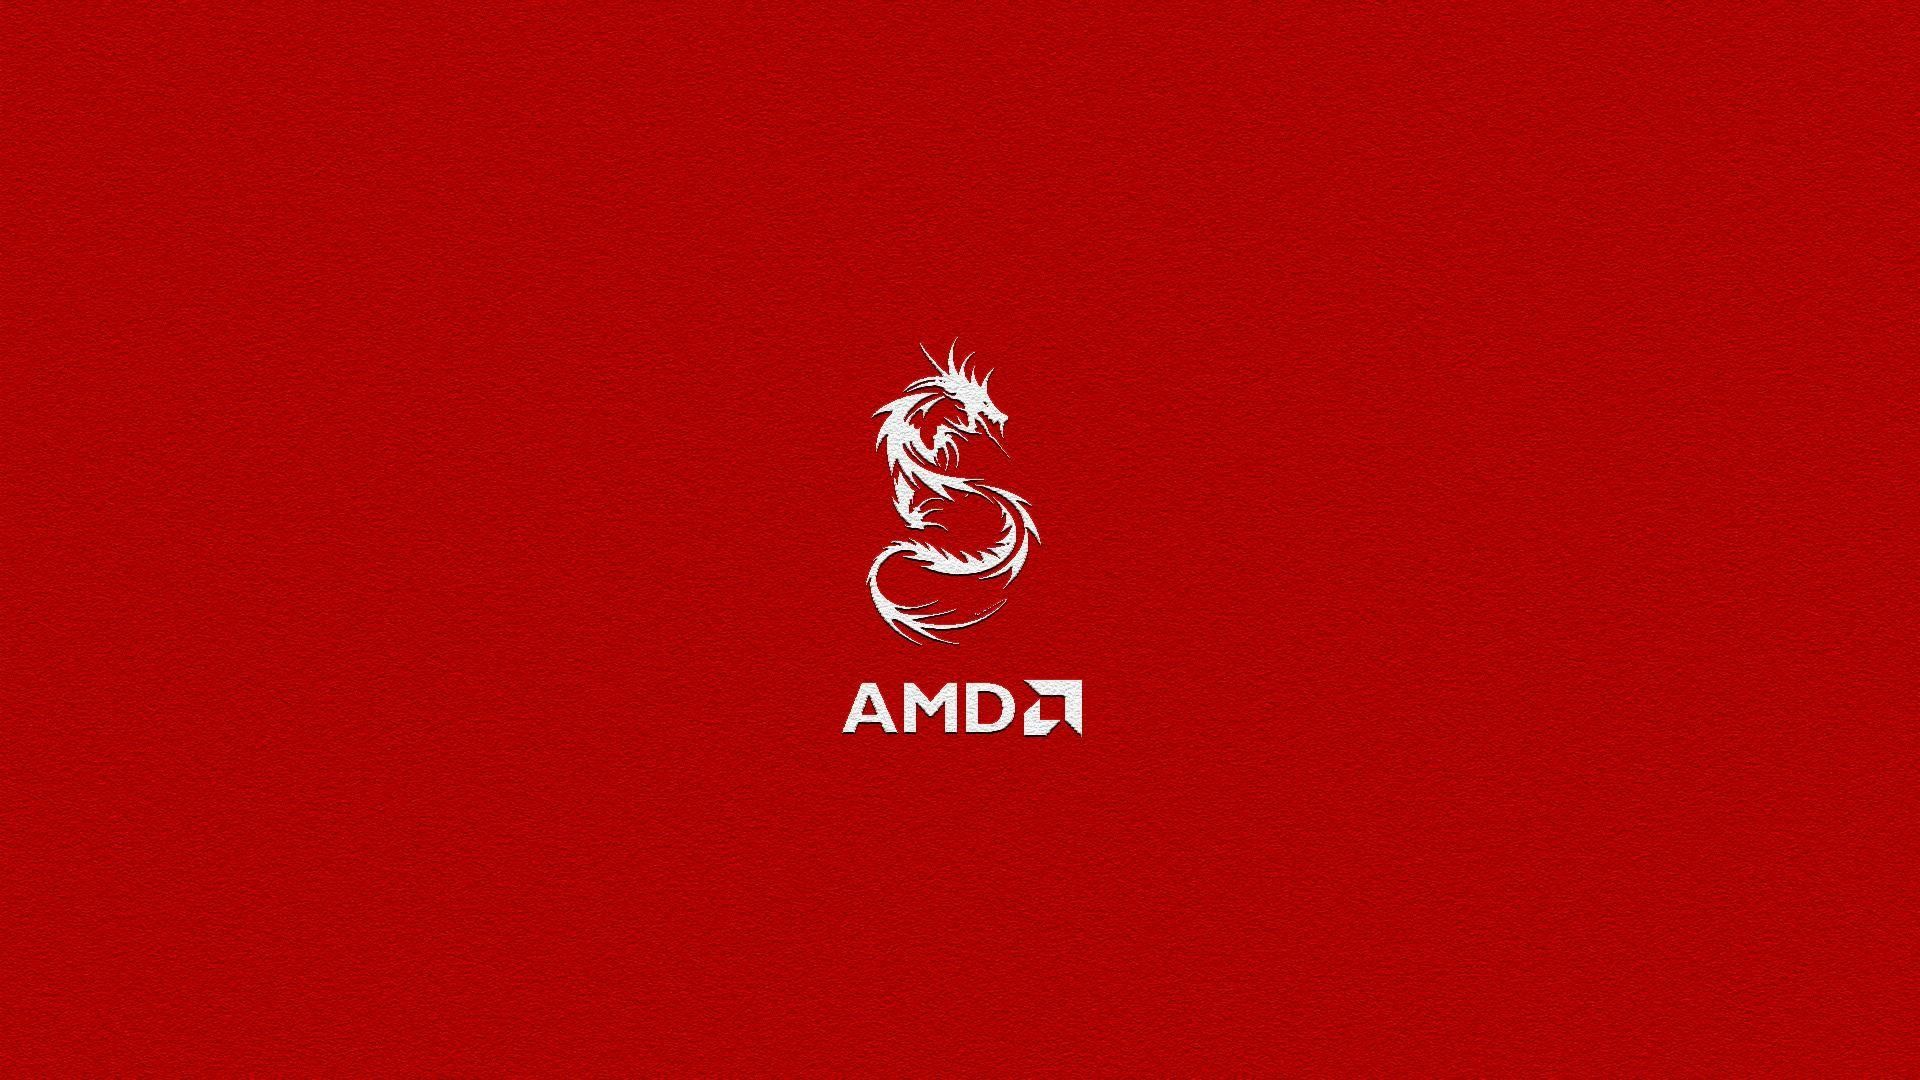 wallpaper.wiki-Amd-Fx-Desktop-Background-PIC-WPC0013187